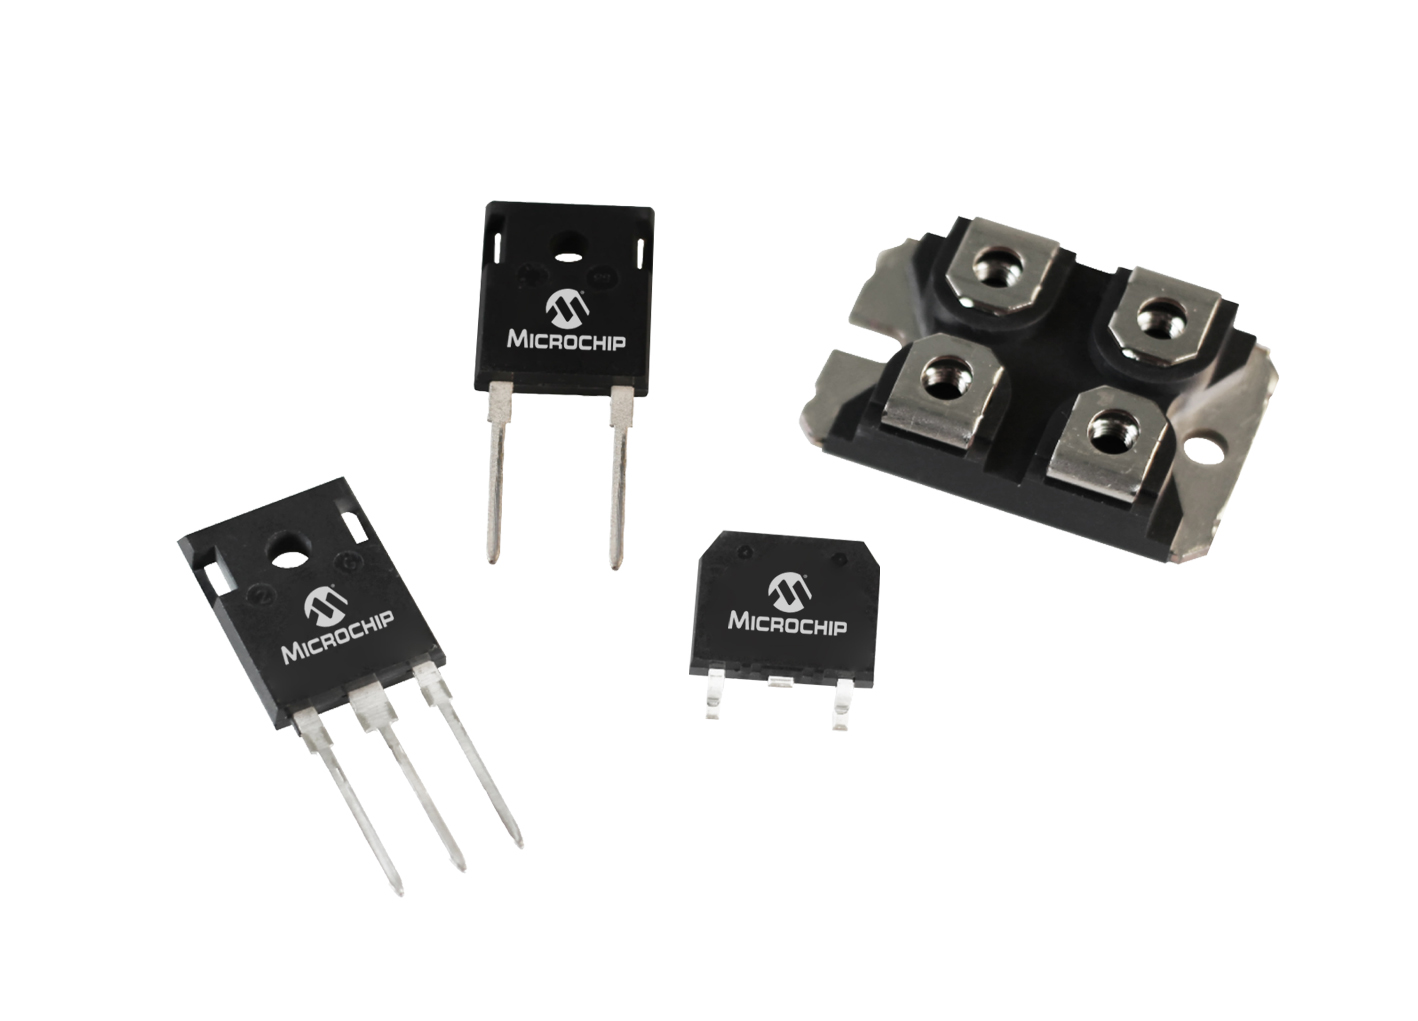 DPM-chipstandalone